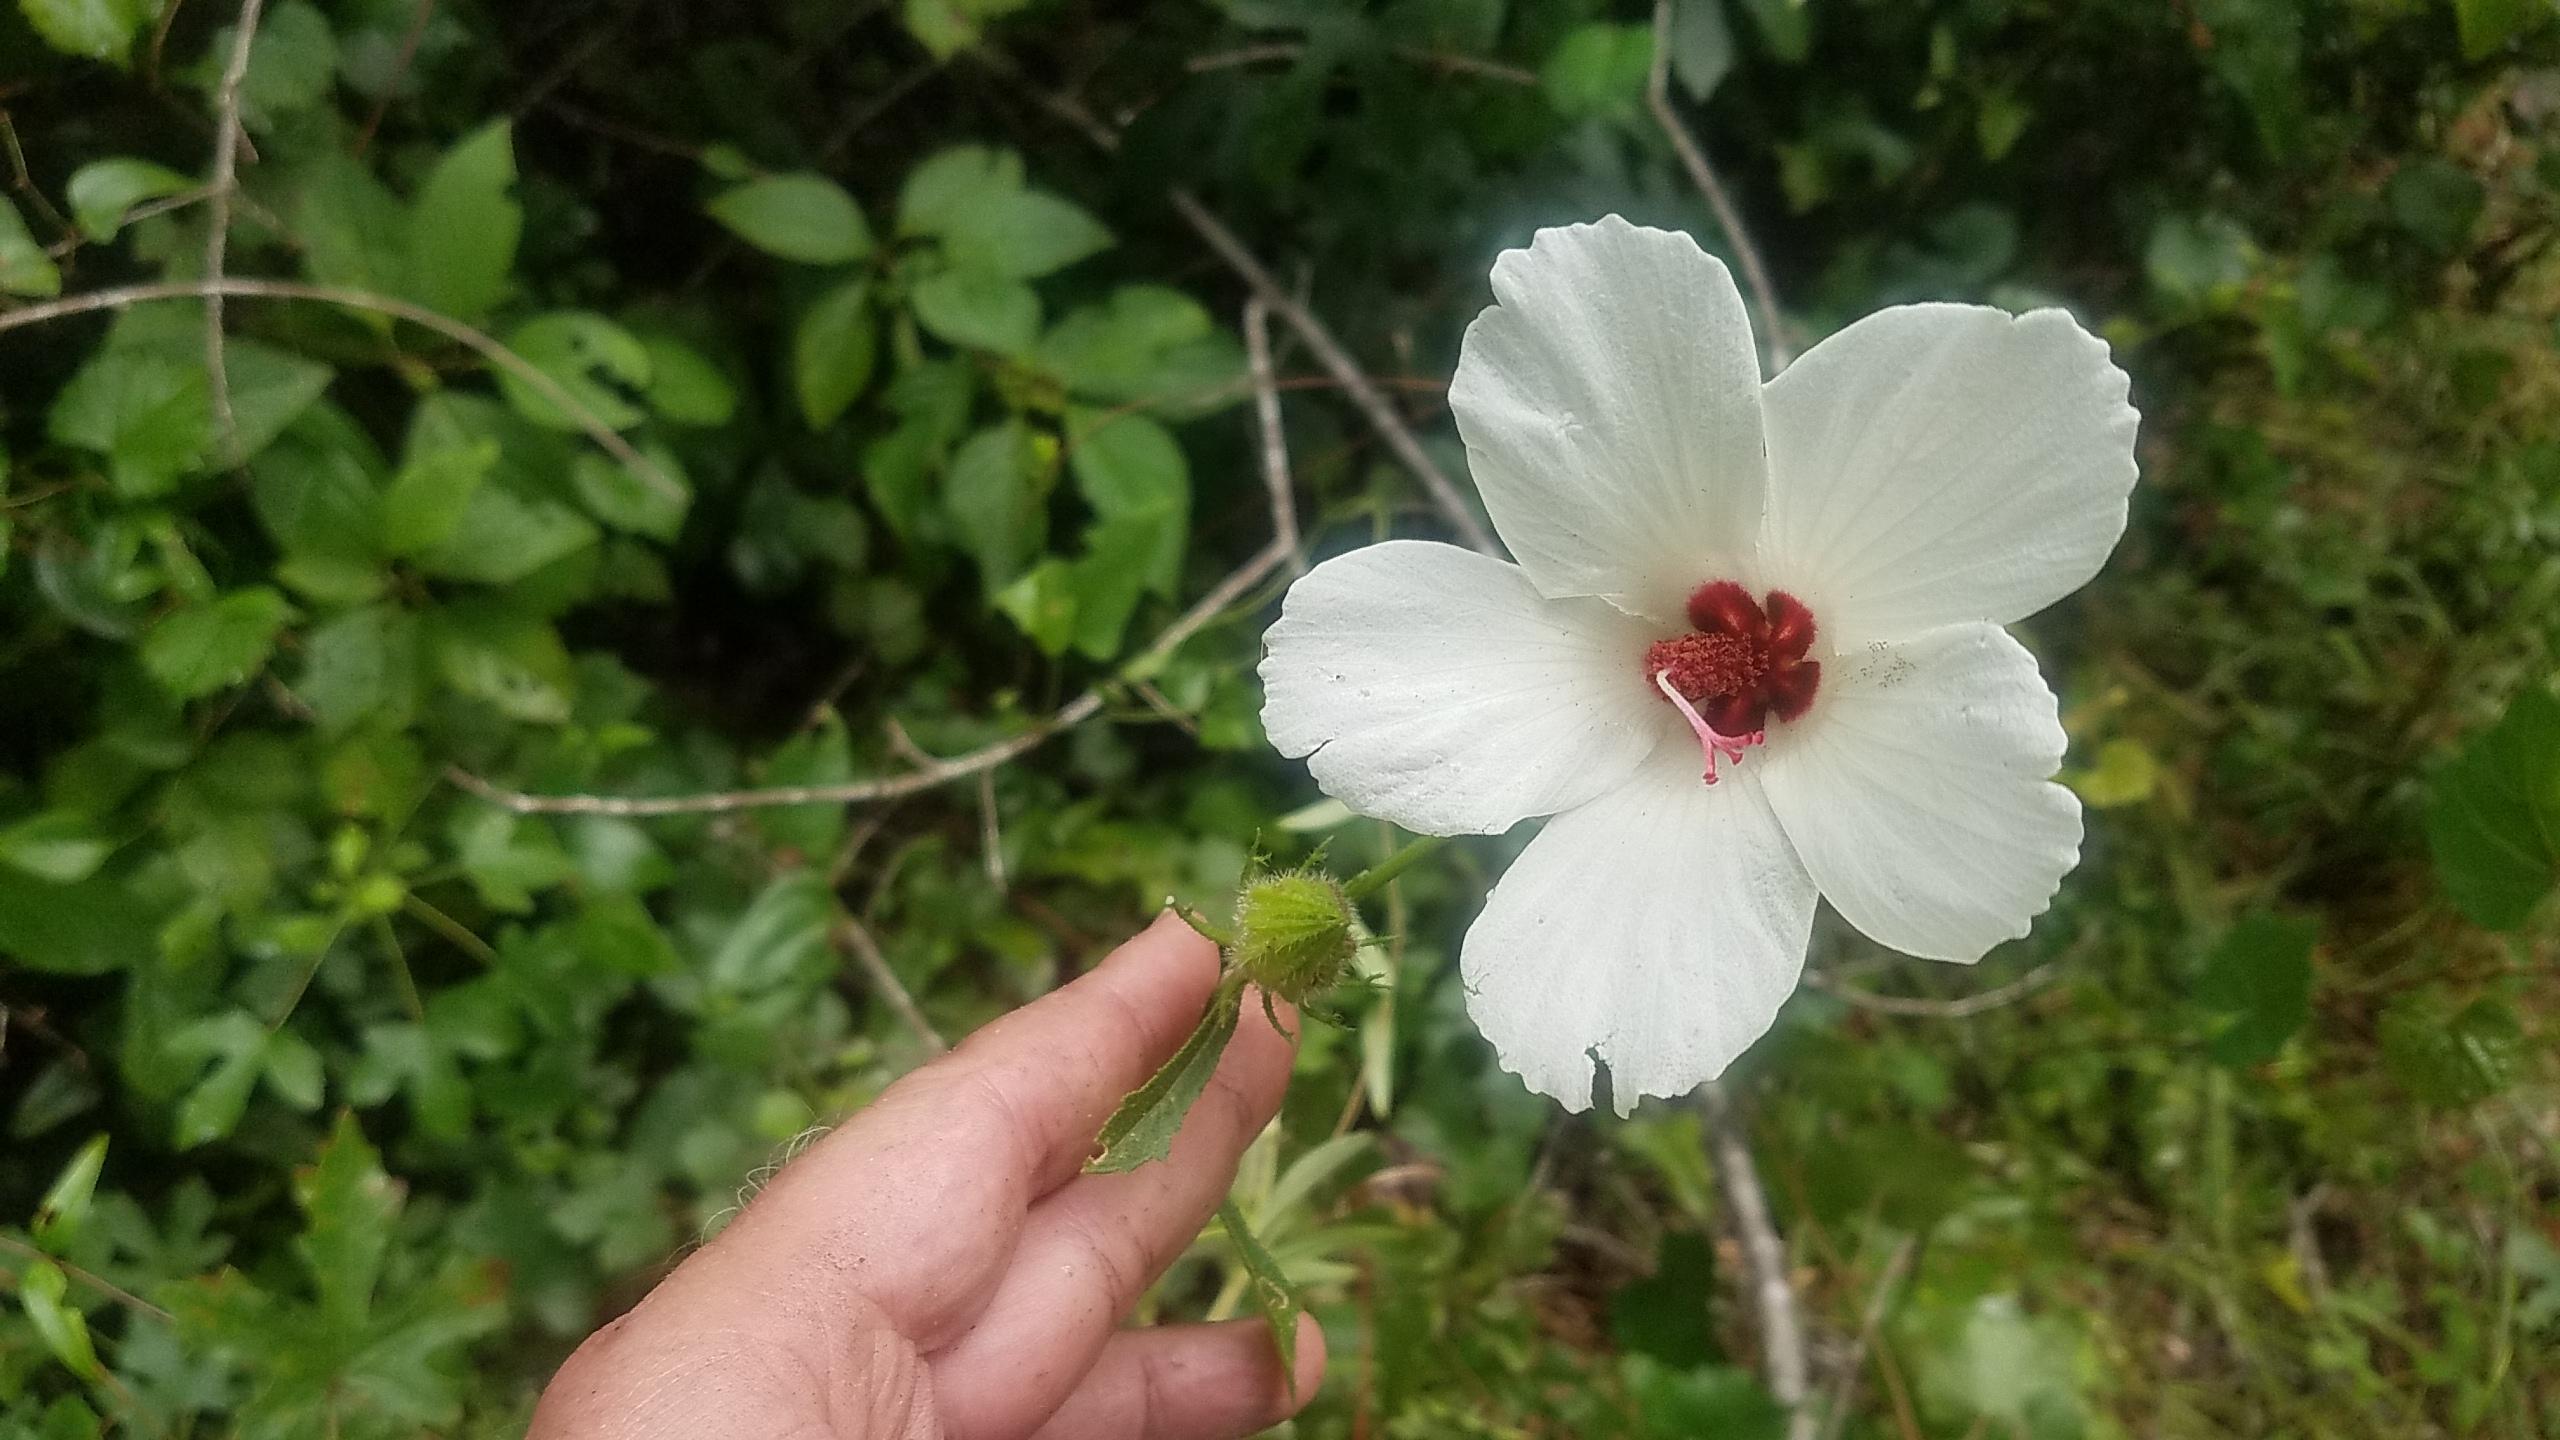 2560x1440 Five petals, Bloom and bud, in Halberleaf Rosemallow, by John S. Quarterman, for OkraParadiseFarms.com, 16 July 2018